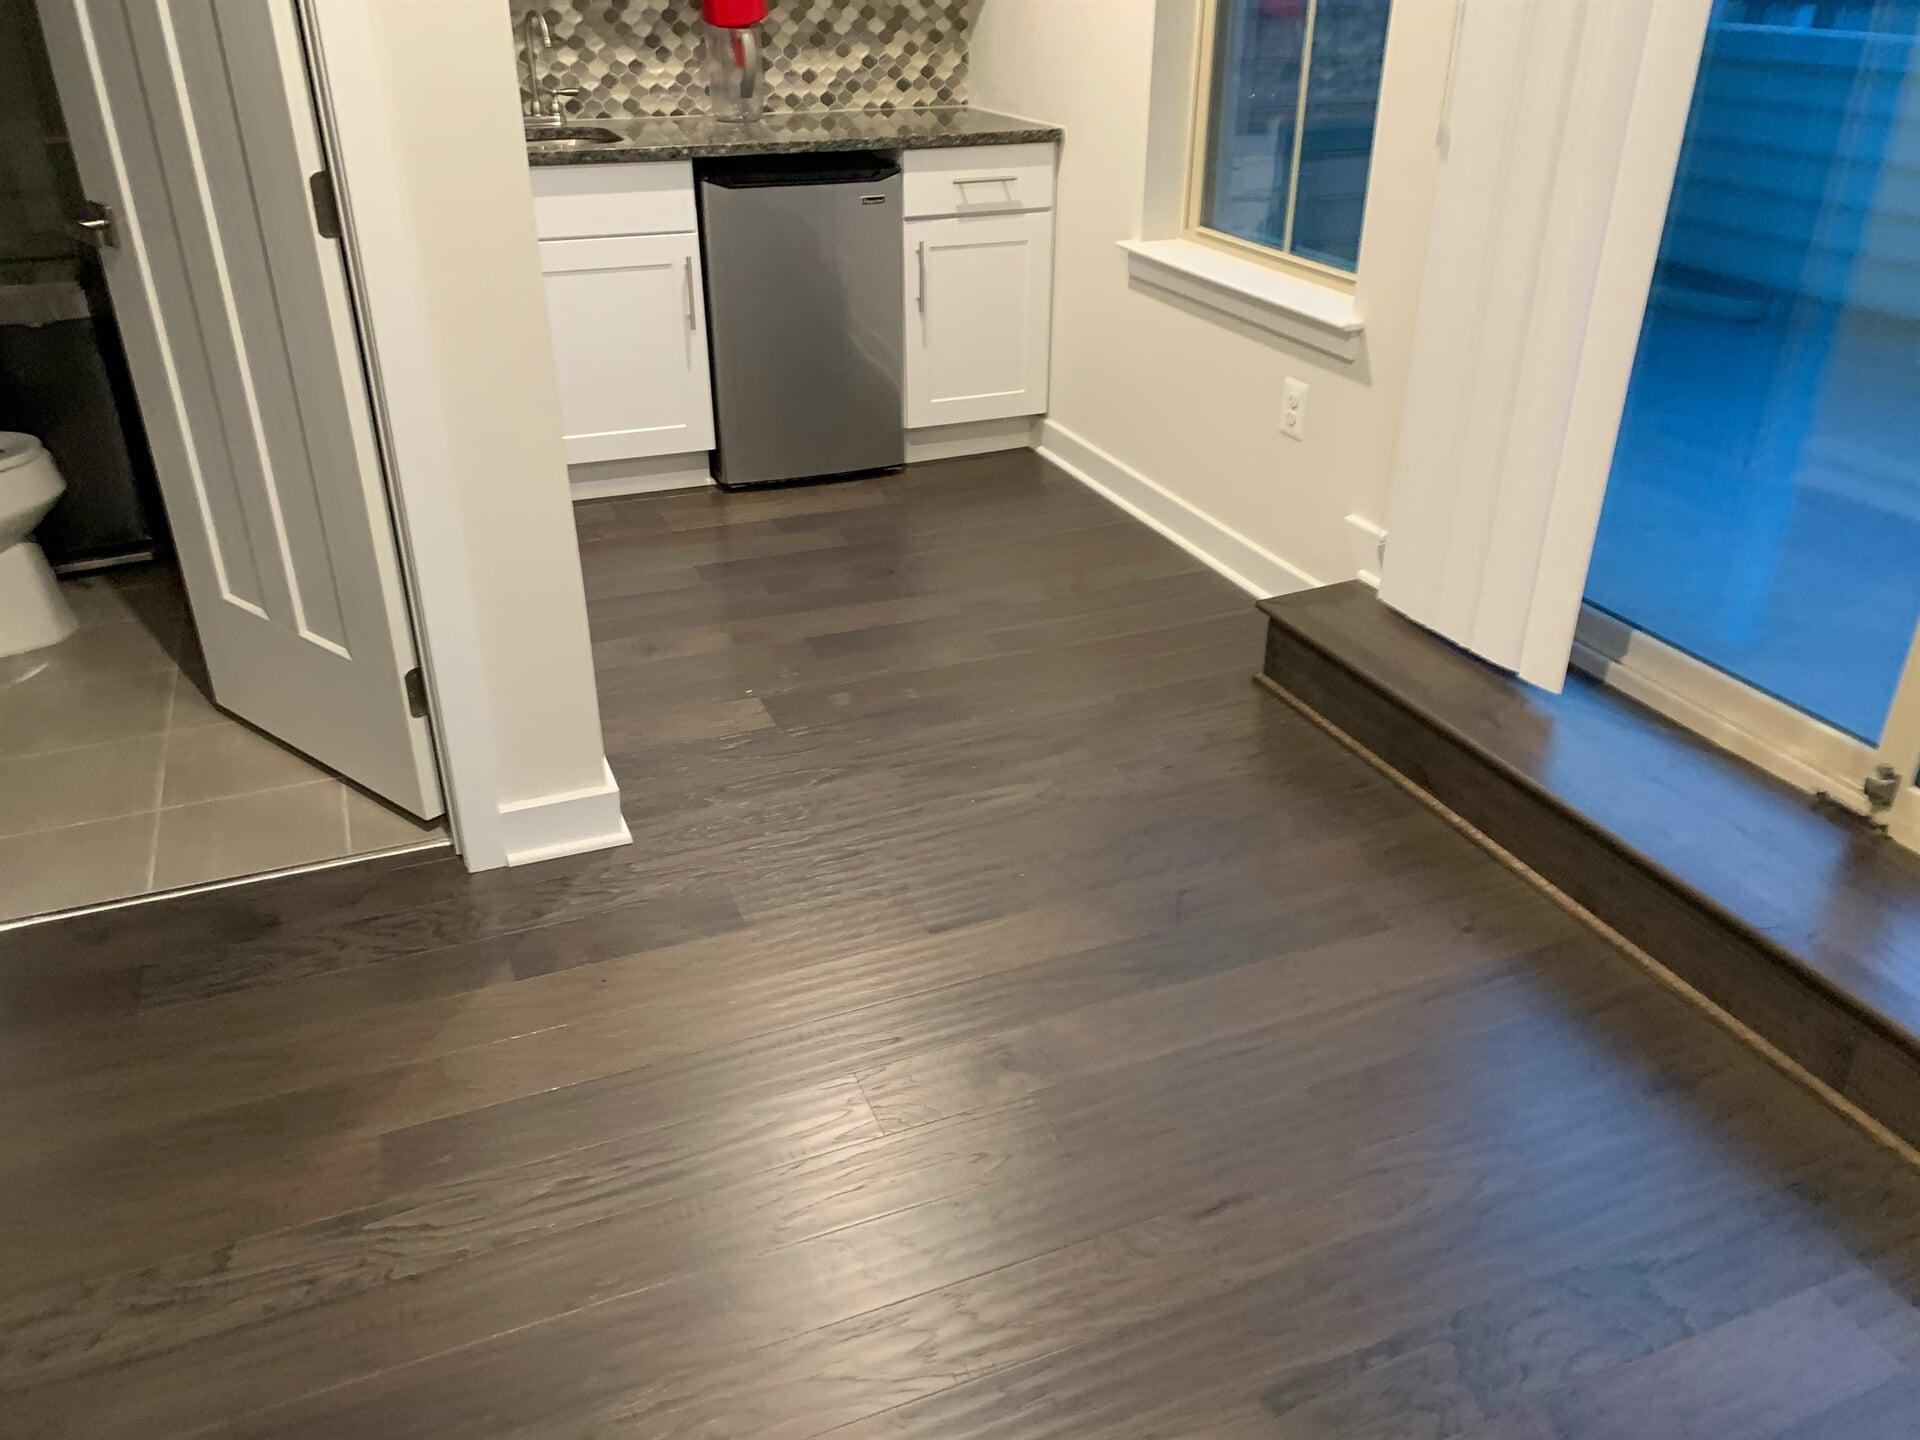 Luxury vinyl plank flooring in Fairfax, VA from Carpet & Floor Express